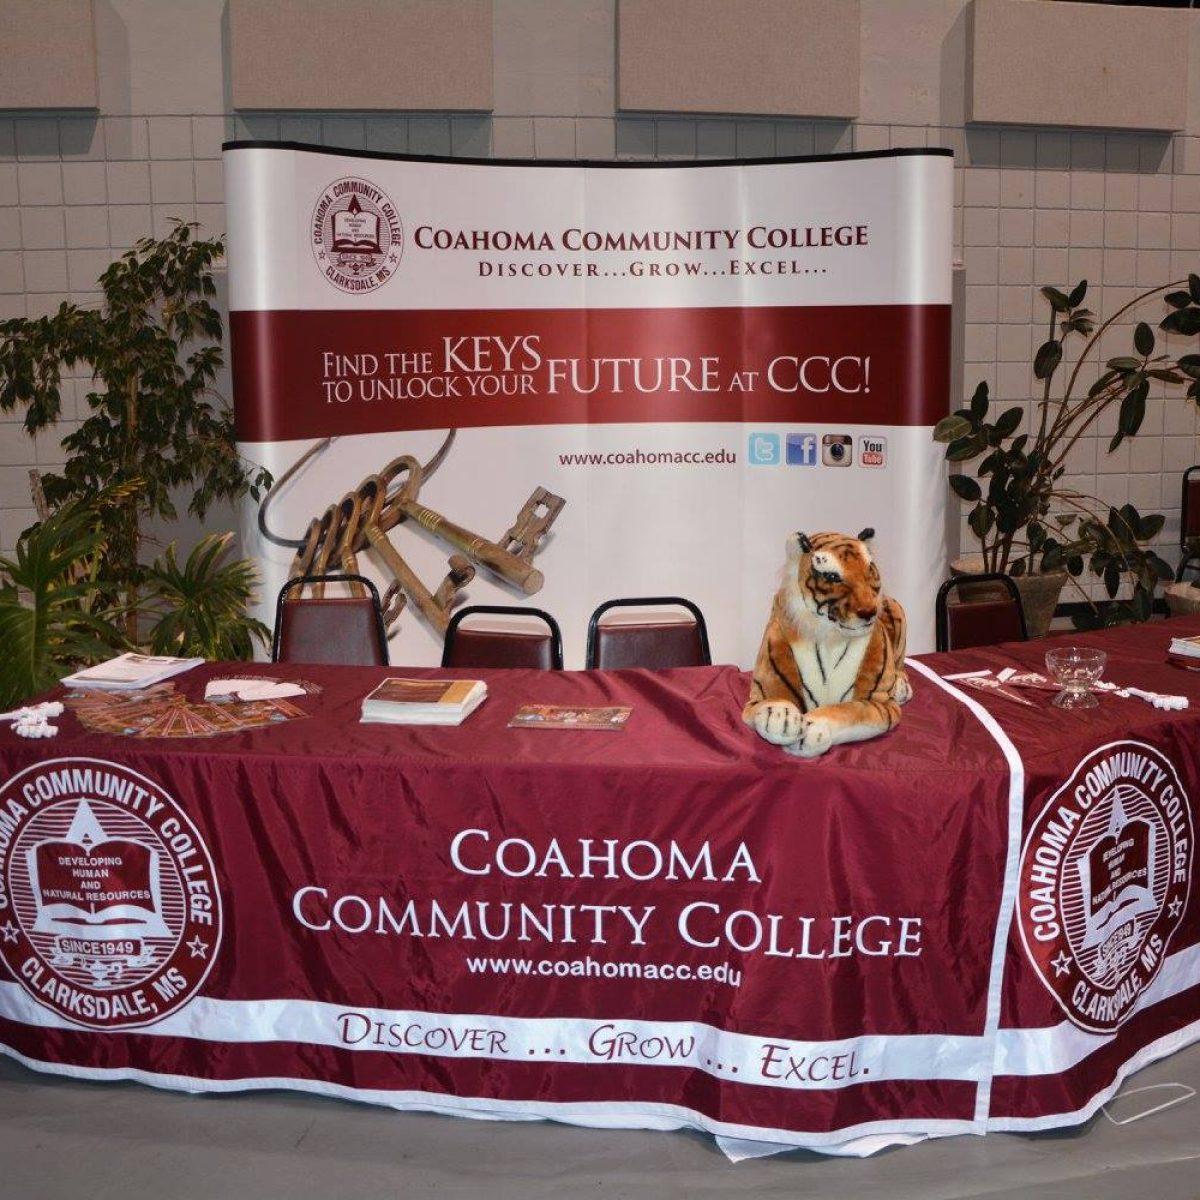 21) Coahoma Community College